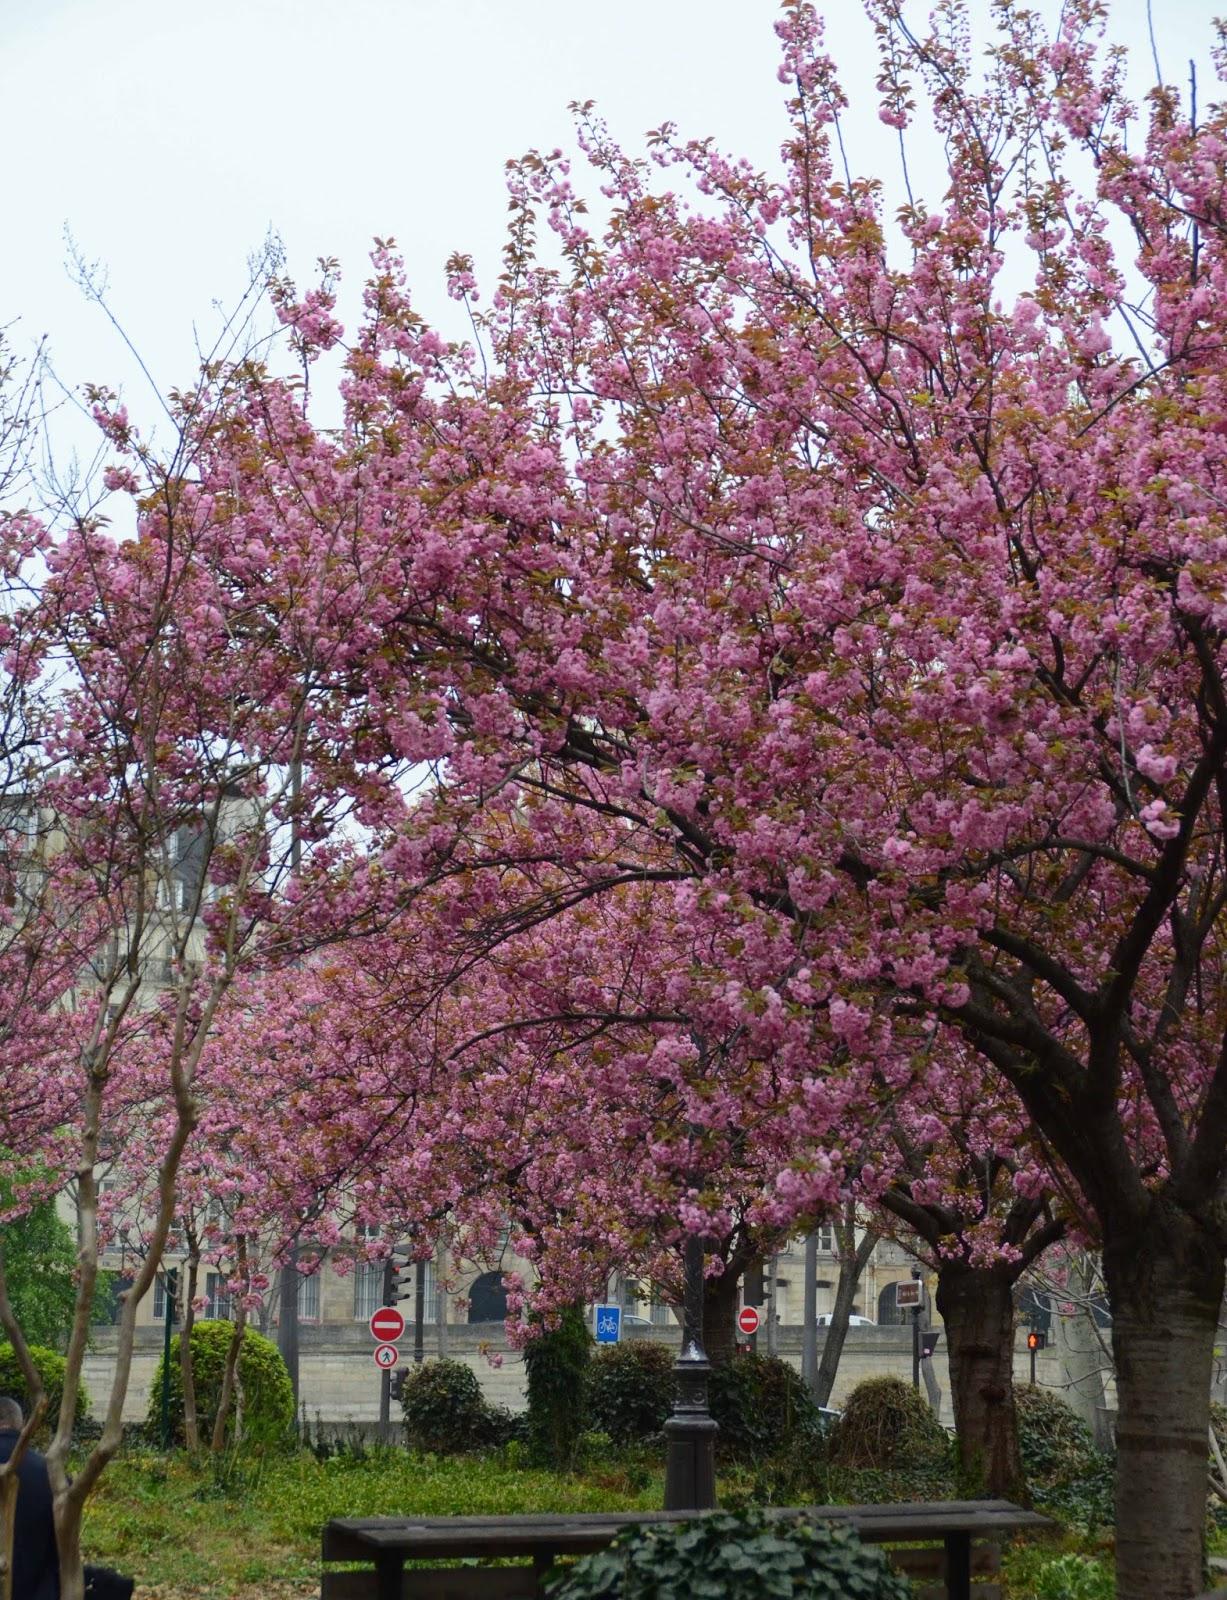 Paris and beyond jardin marie trintignant for Jardin paris